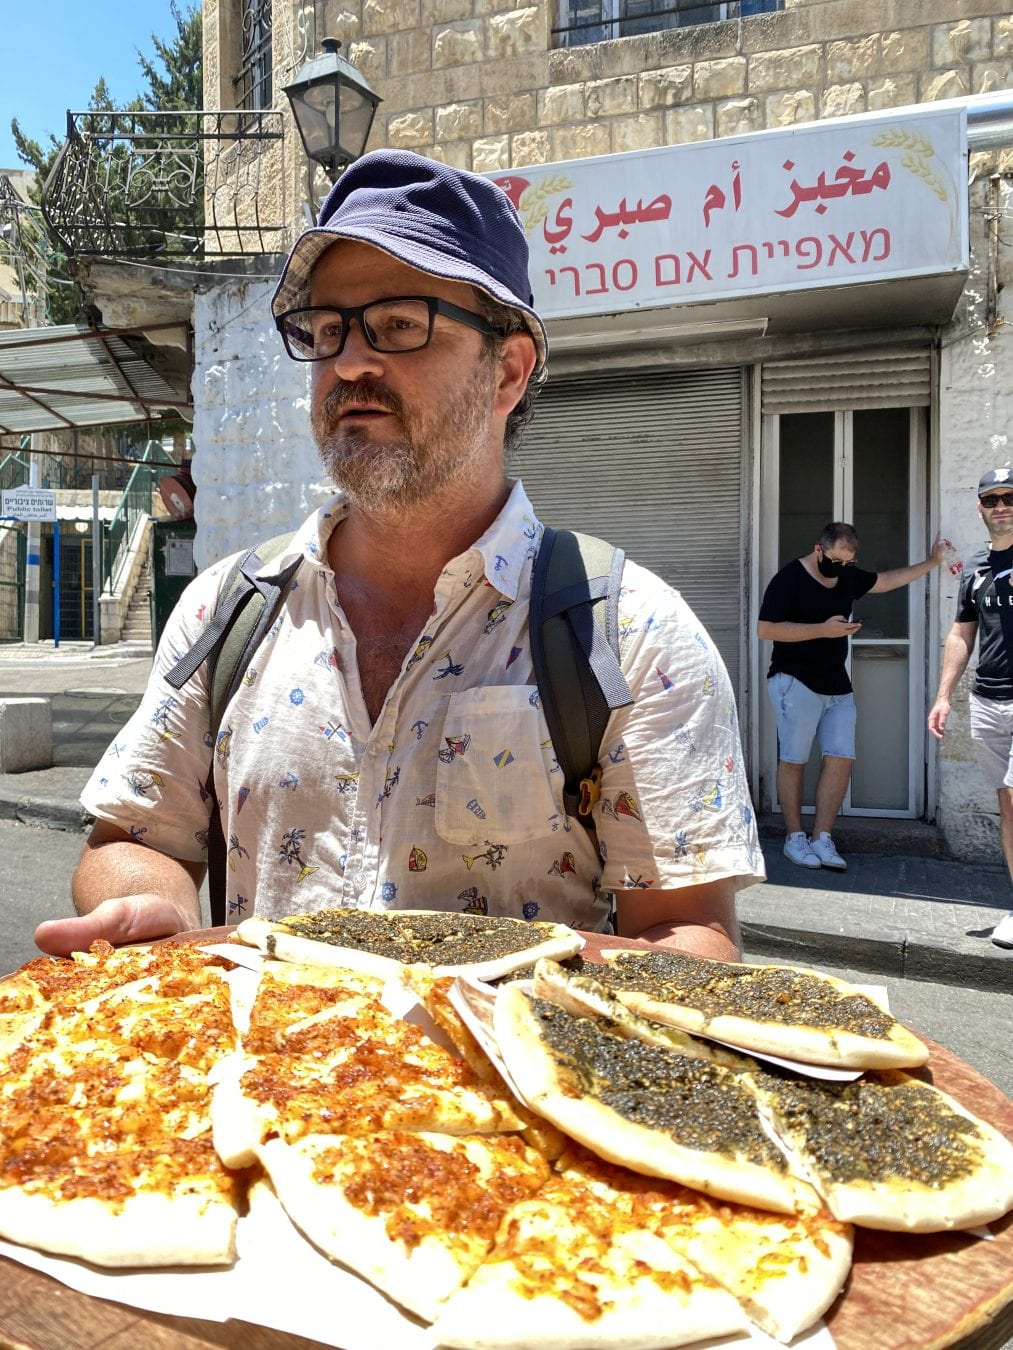 haifa shuk and cook שרון ויעל סיורים קולינרים חיפה